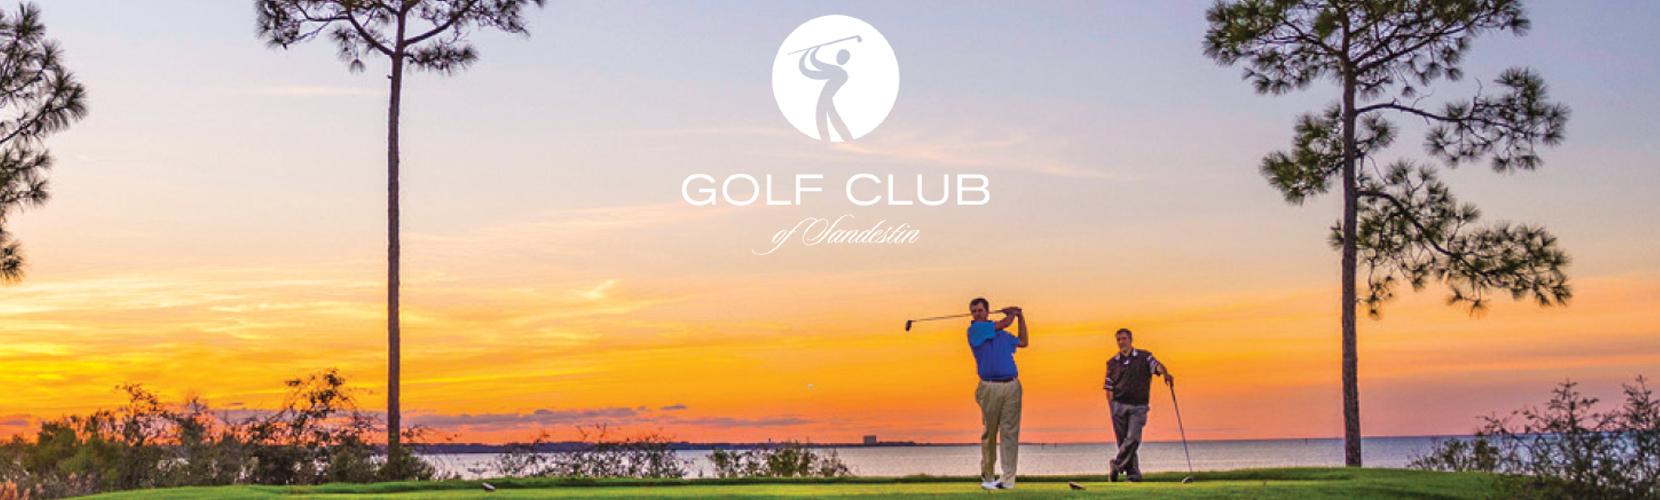 Sandestin Golf Club Two Men Golfing